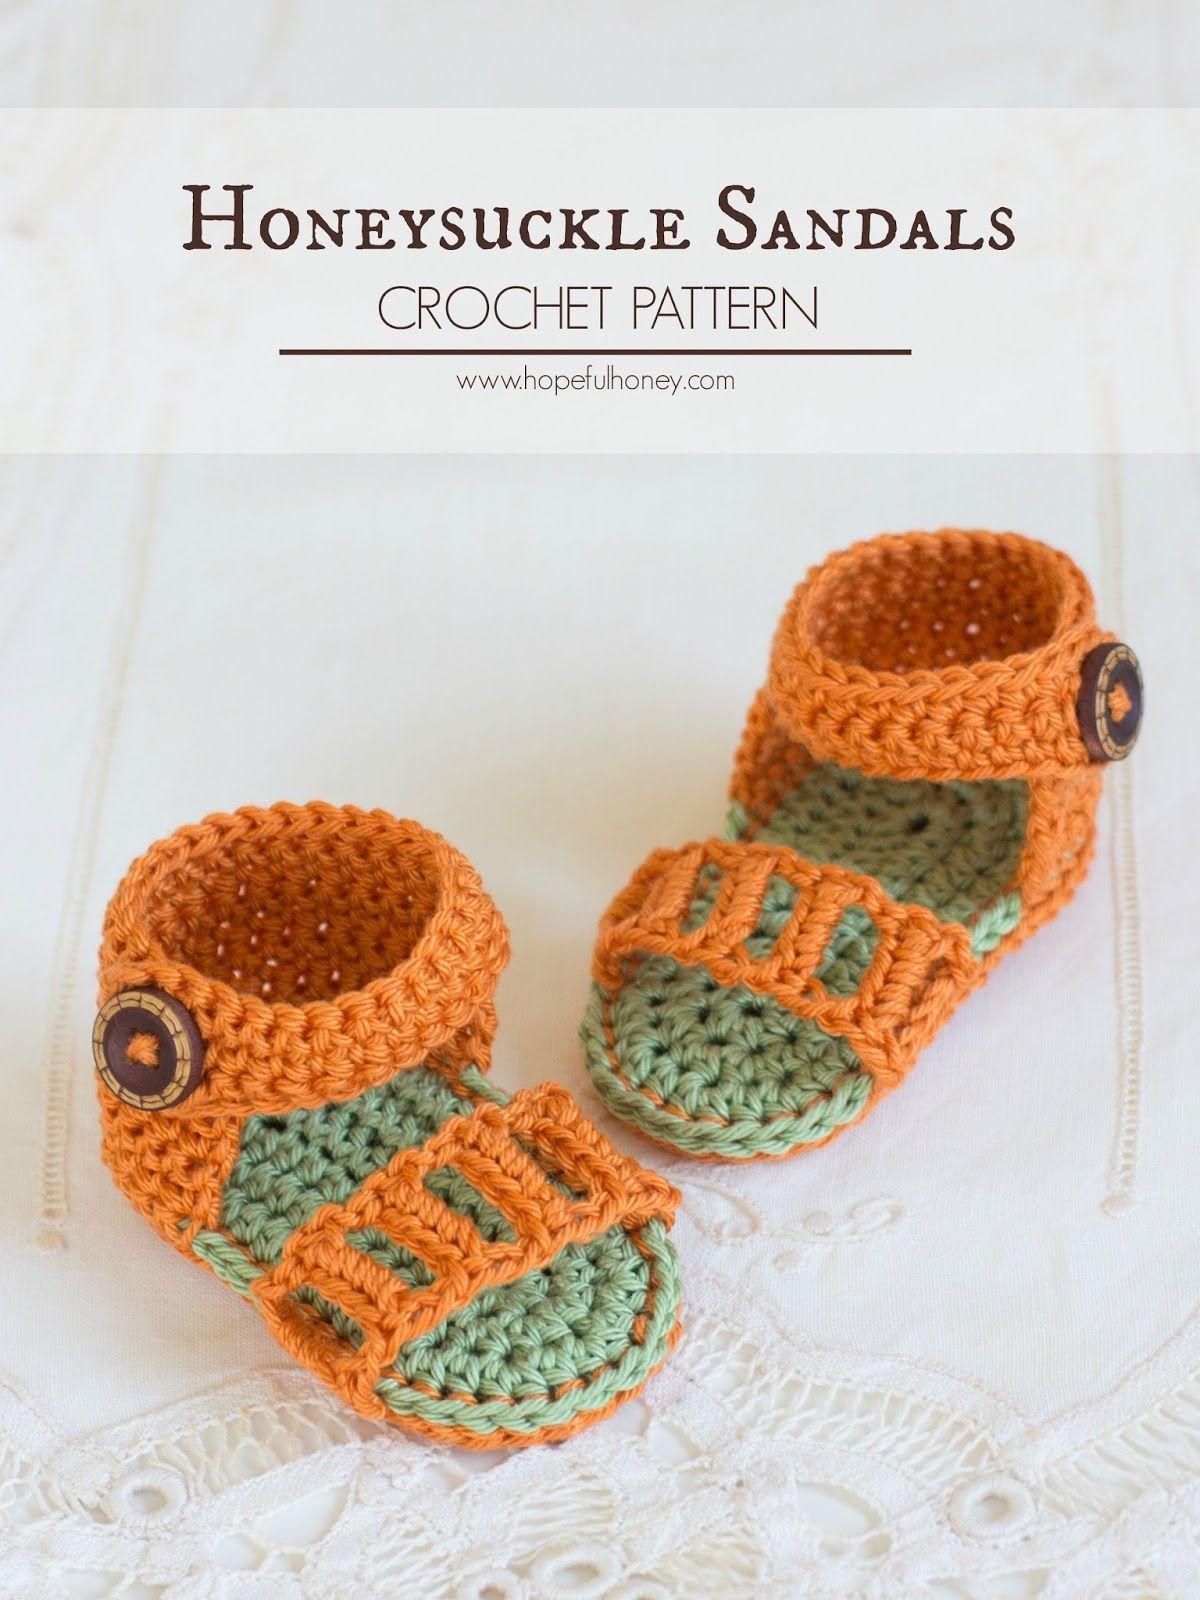 Honeysuckle Baby Sandals - Free Crochet Pattern | Crochet cuties ...